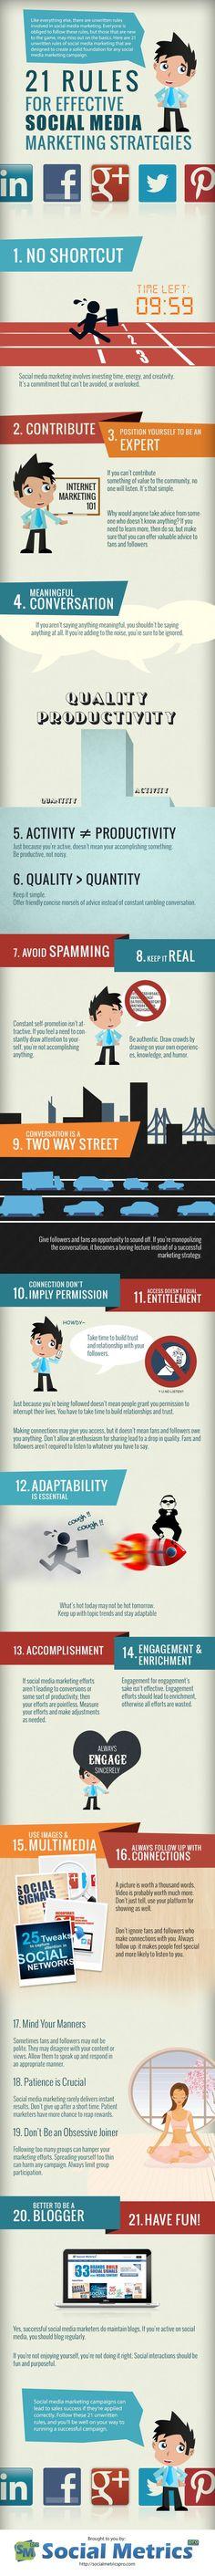 21-conseils-pour-strategie-social-media-efficace-infographie